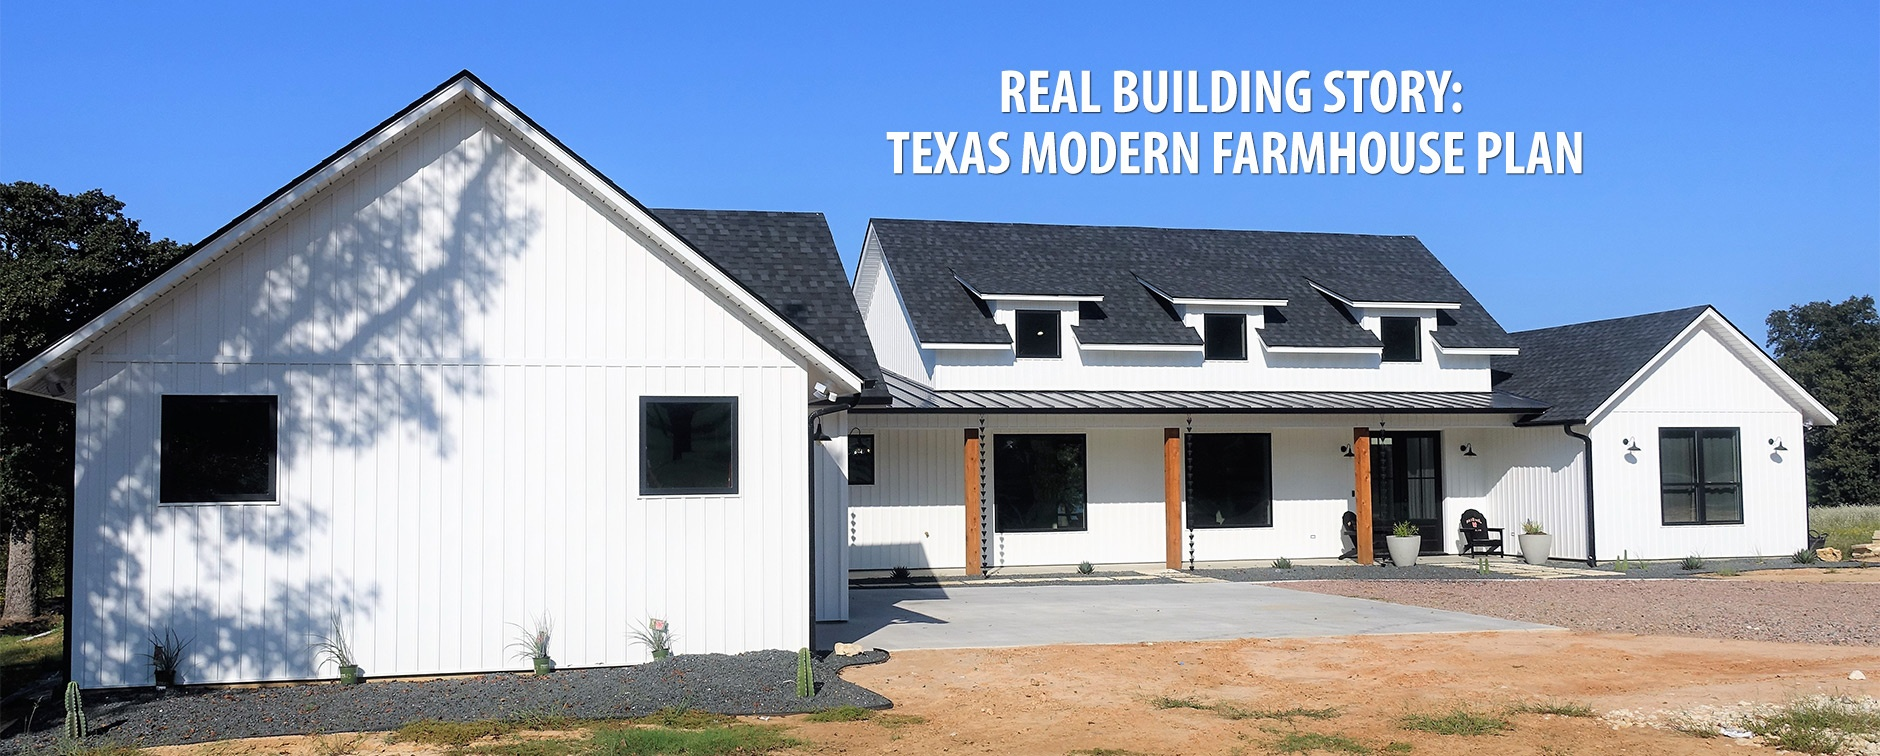 Real Building Story Texas Modern Farmhouse Plan